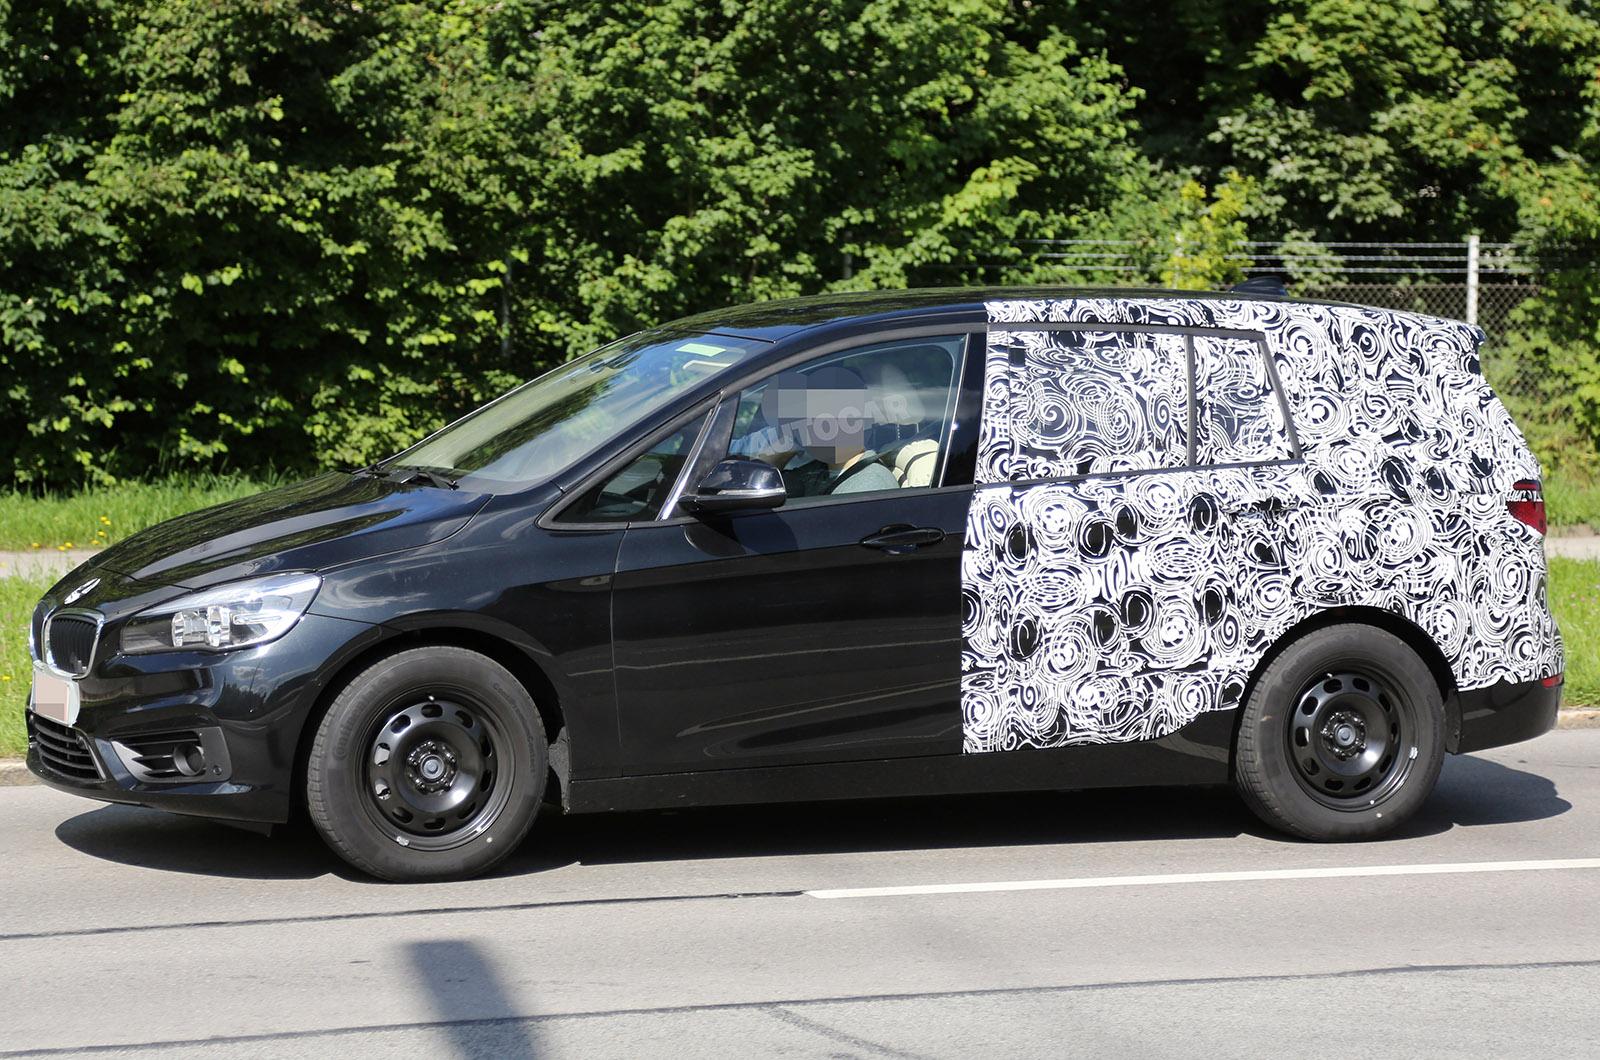 seven seat bmw 2 series active tourer due in 2015 latest pictures autocar. Black Bedroom Furniture Sets. Home Design Ideas